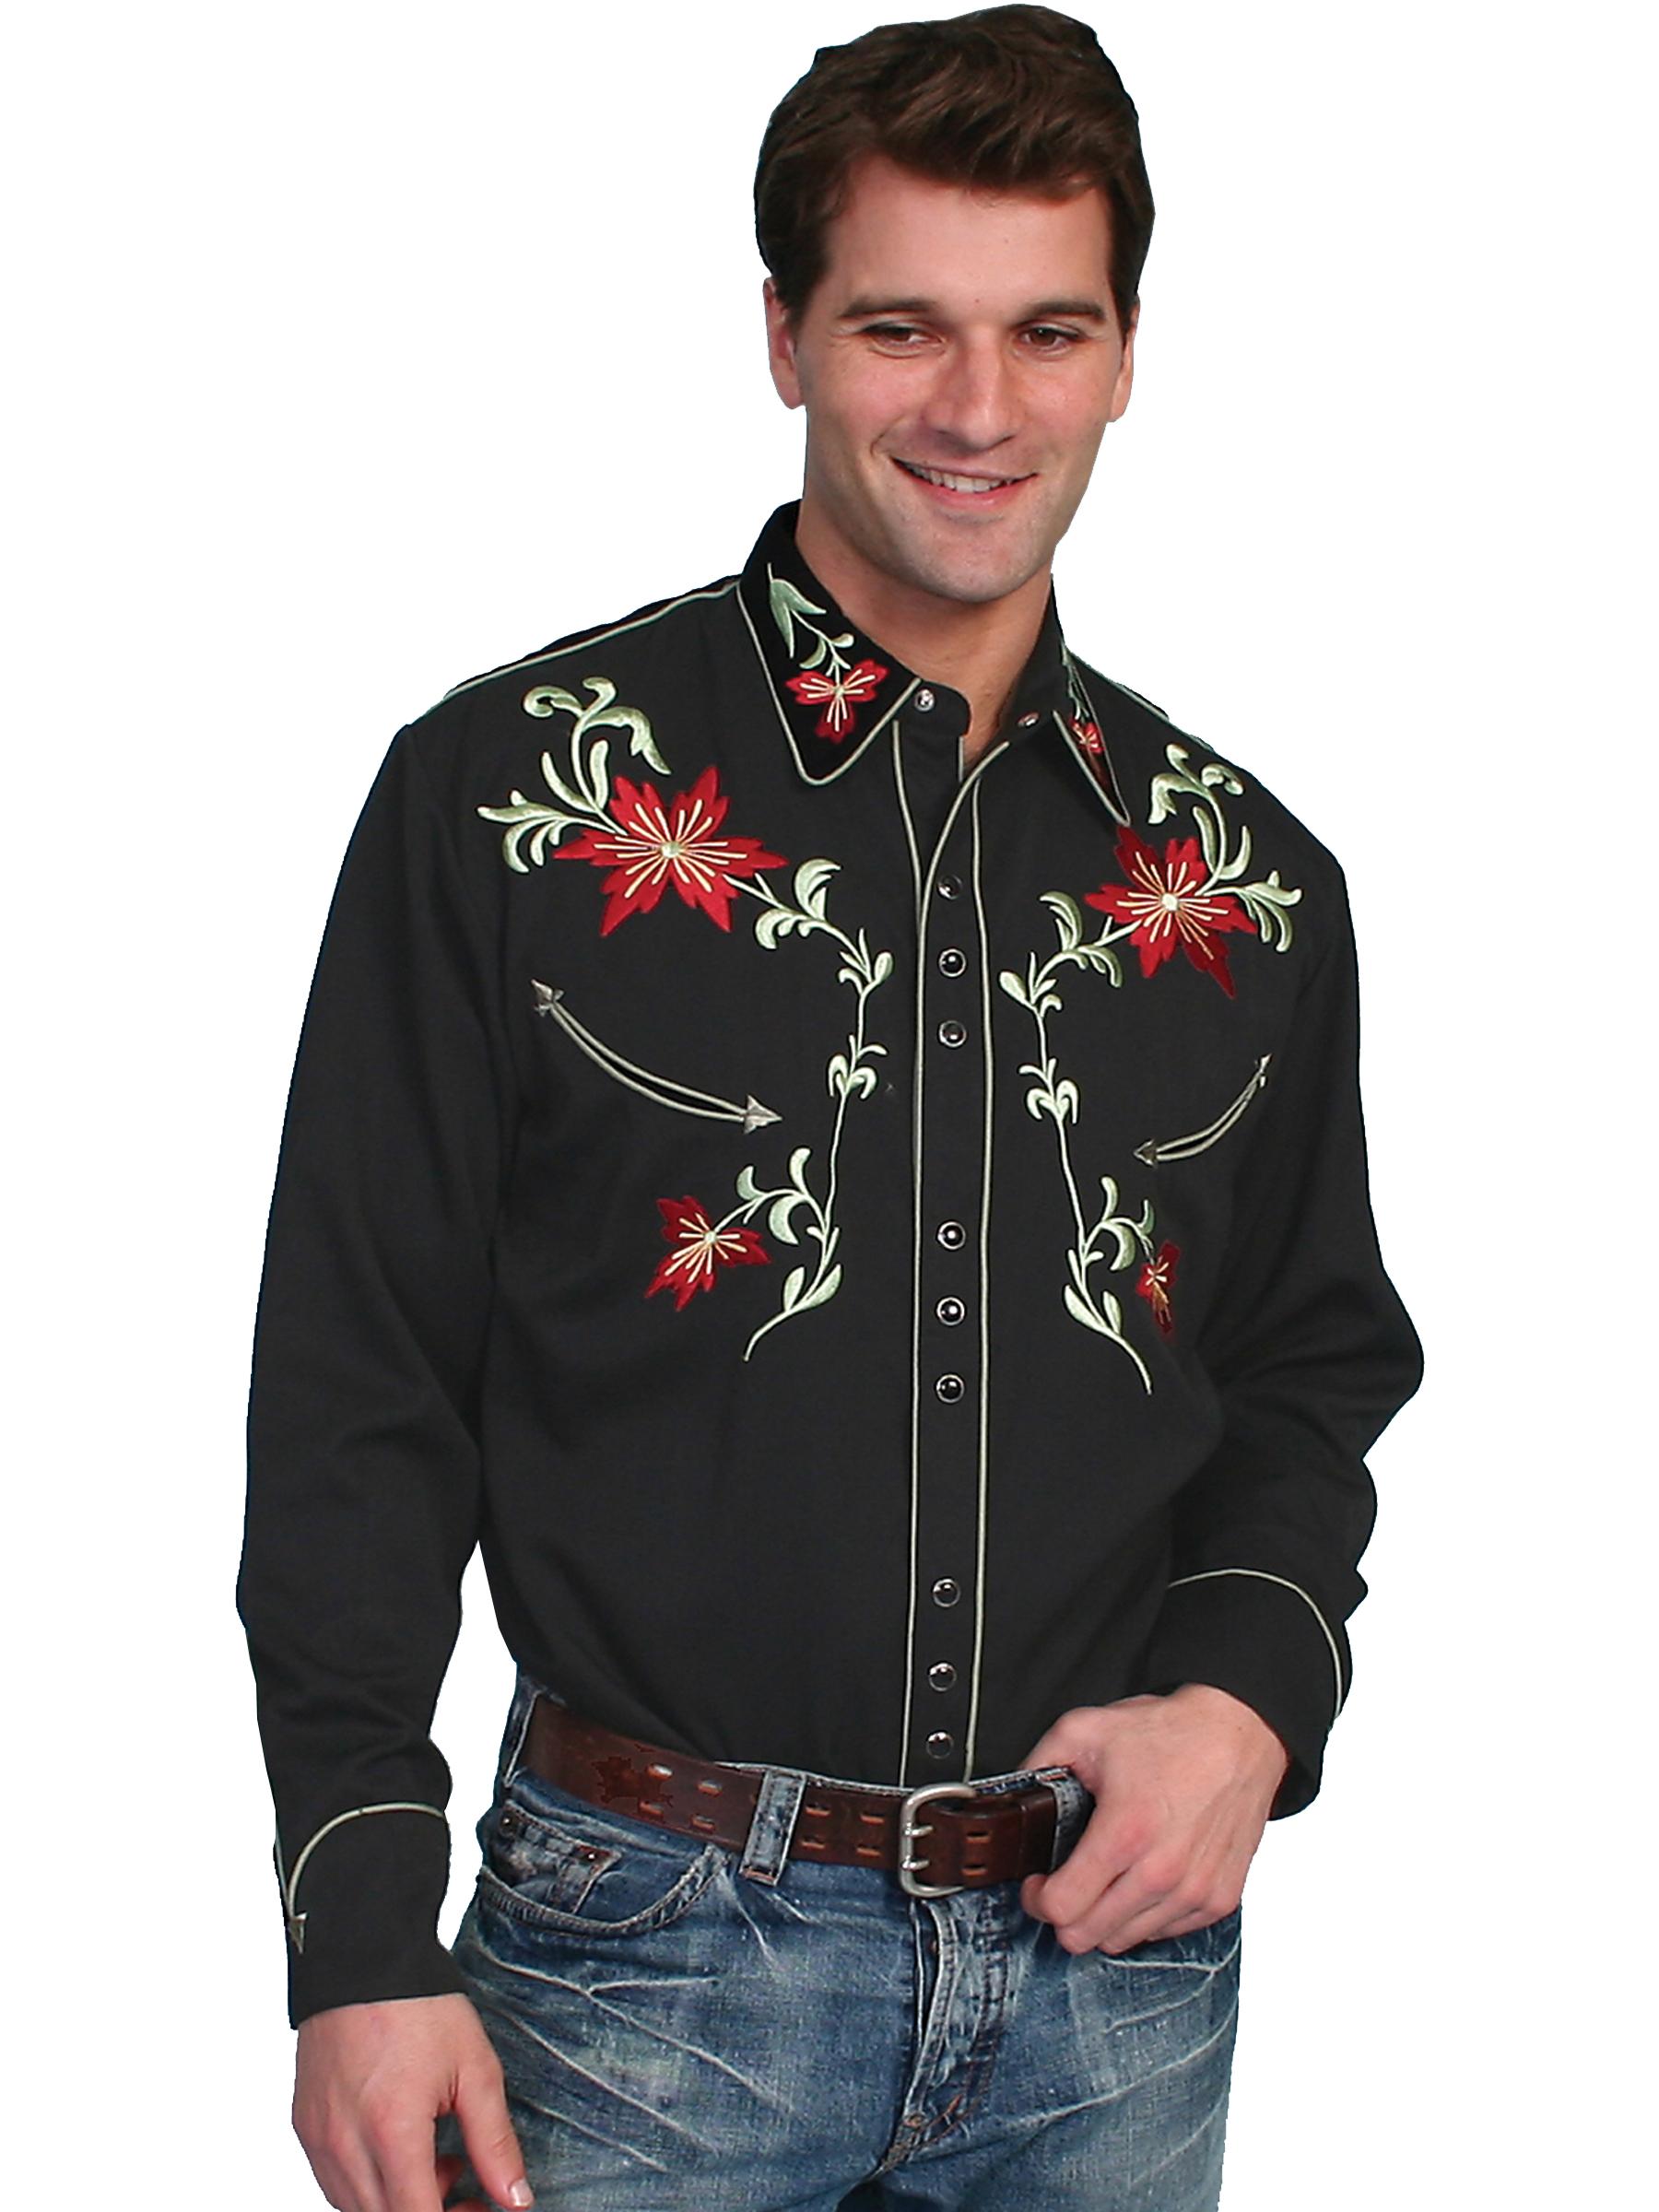 Poly/rayon blend snap front shirt